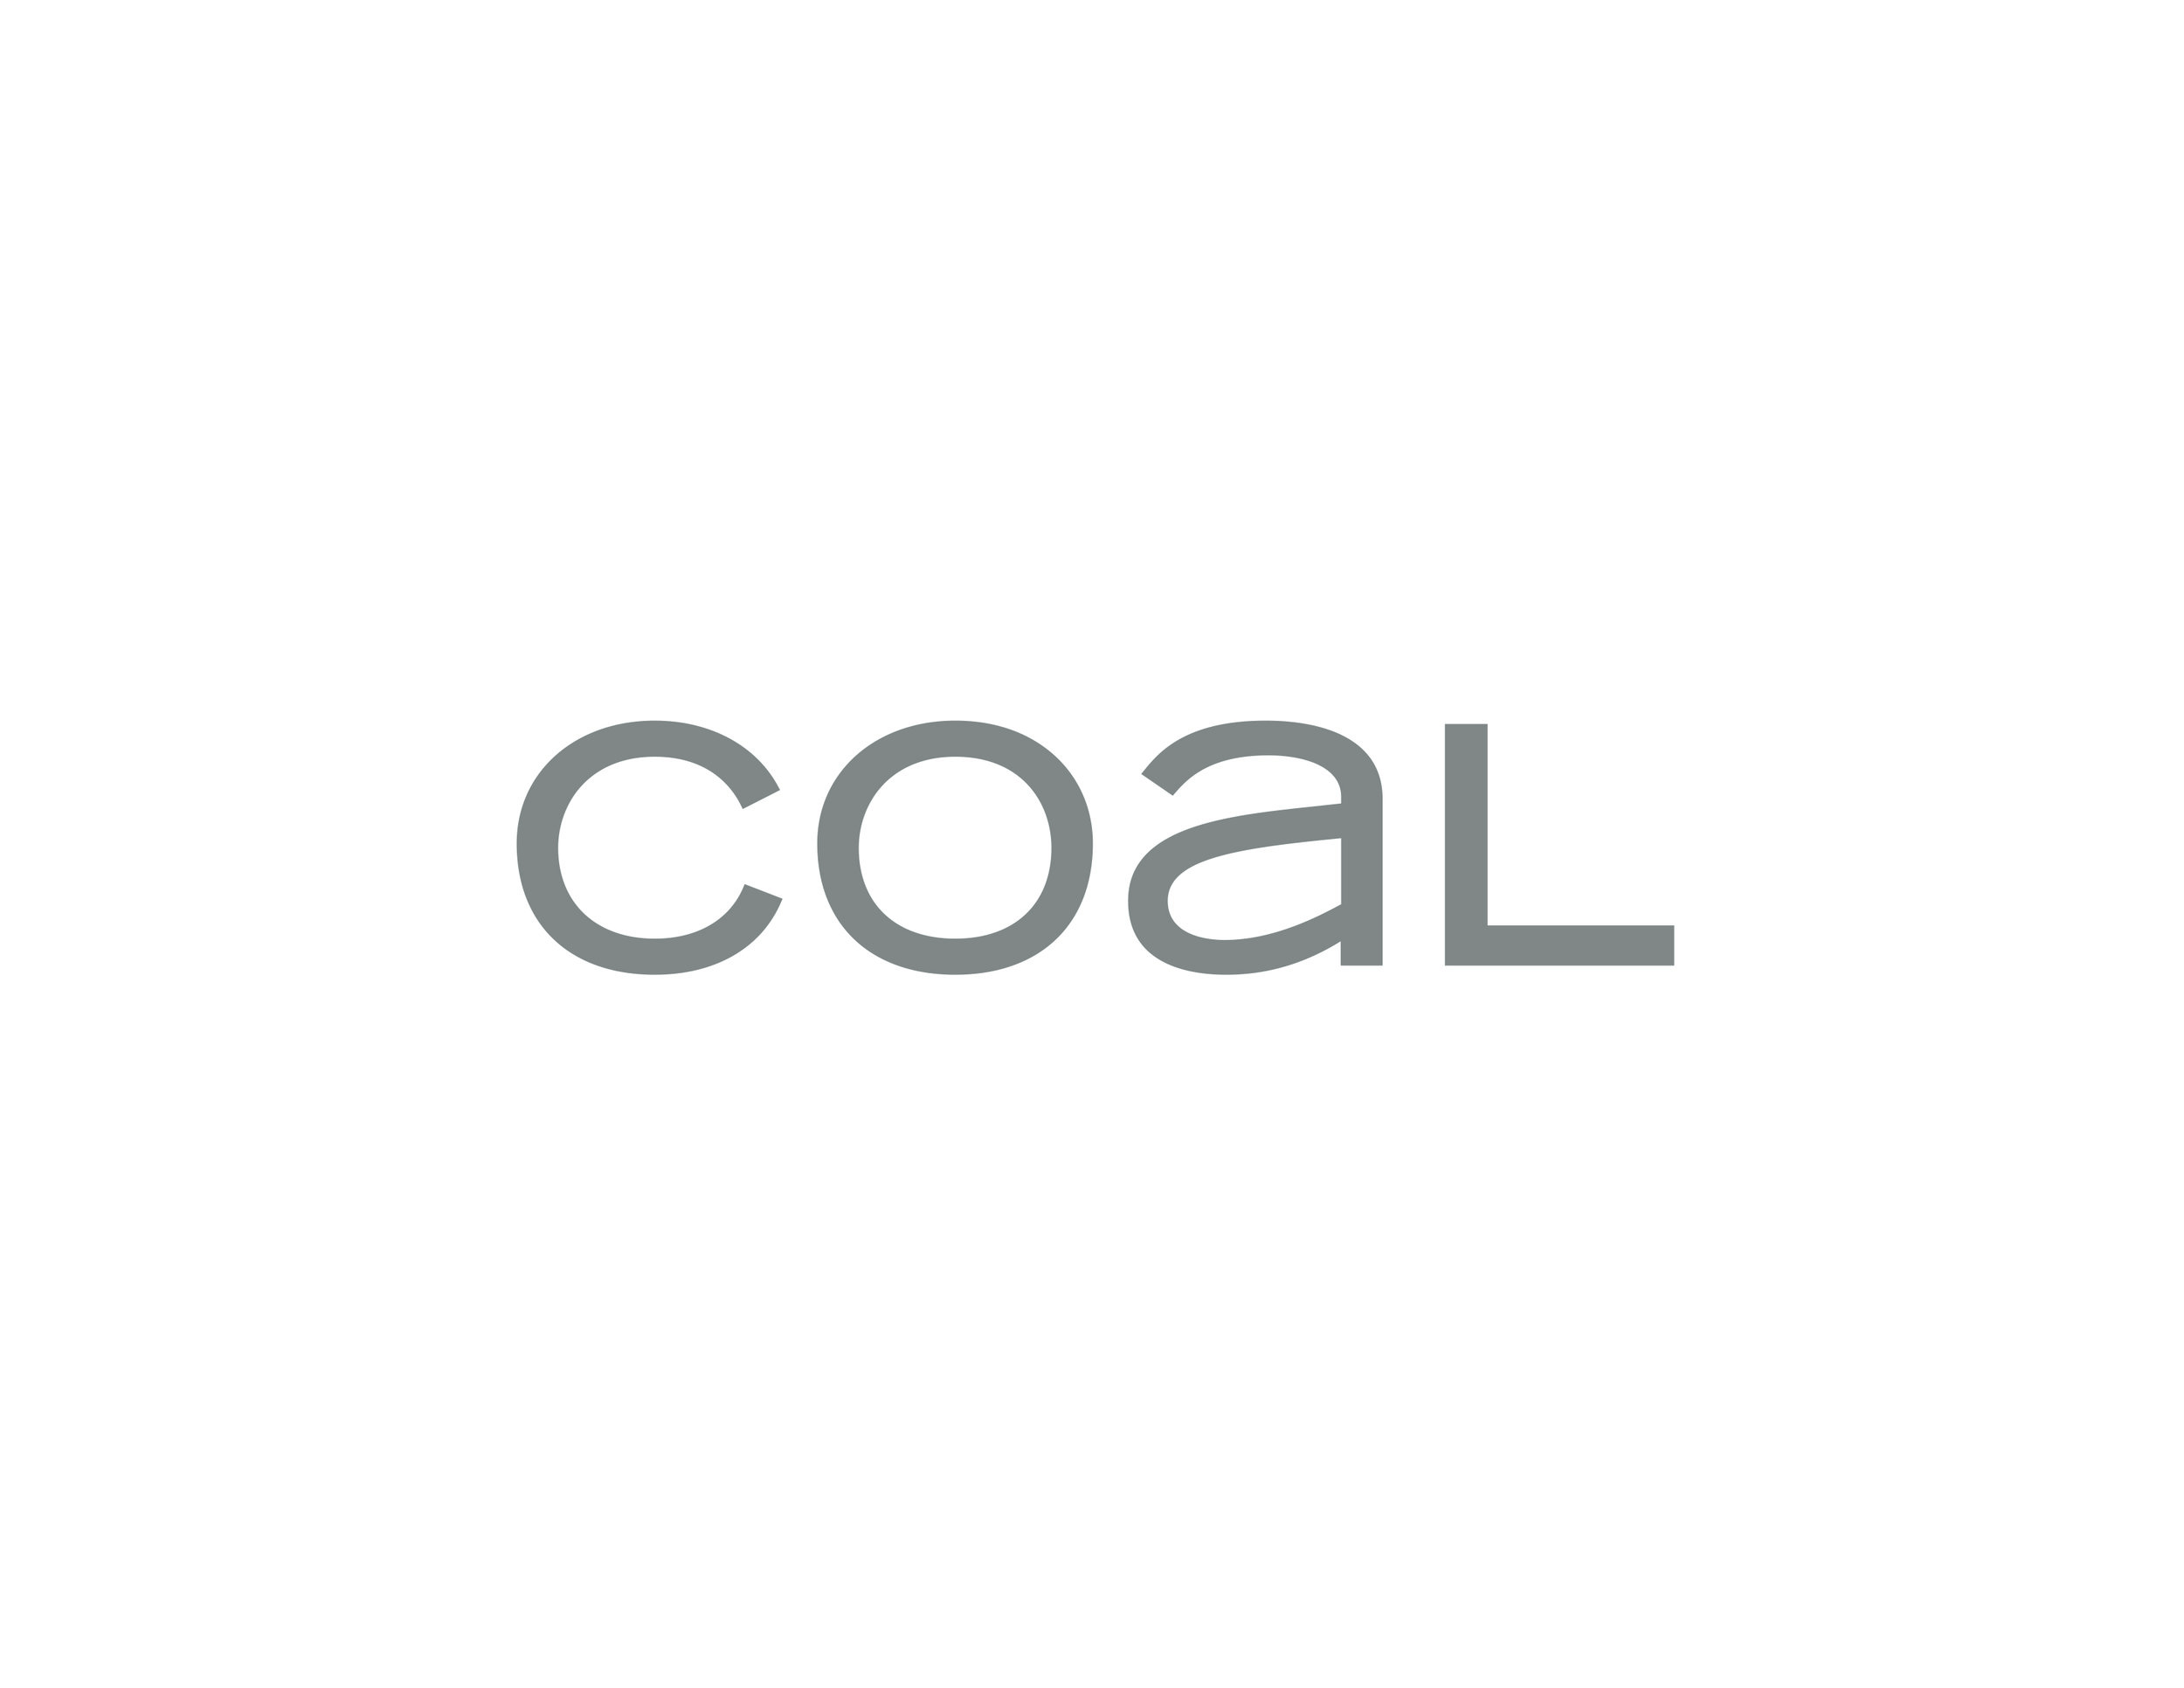 COAL_AI.jpg